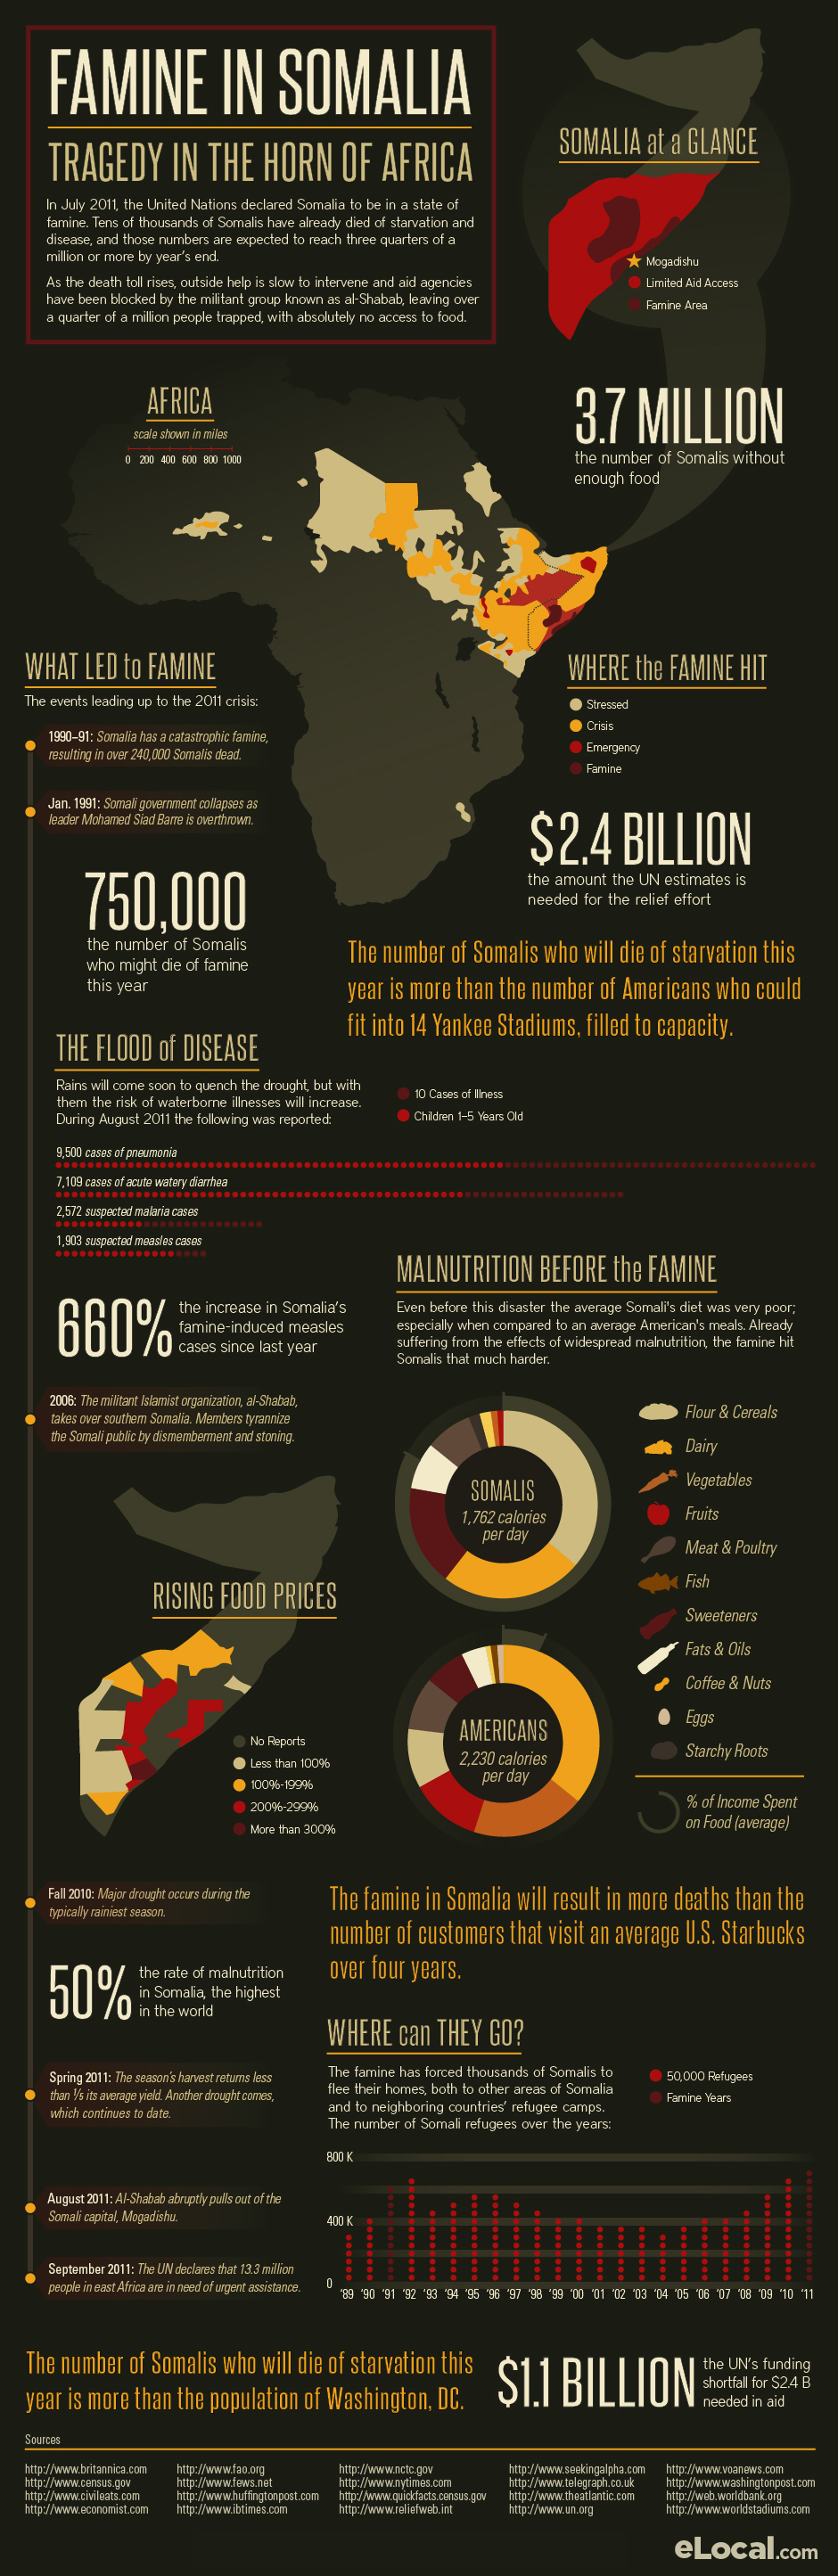 Famine in Somalia Infographic